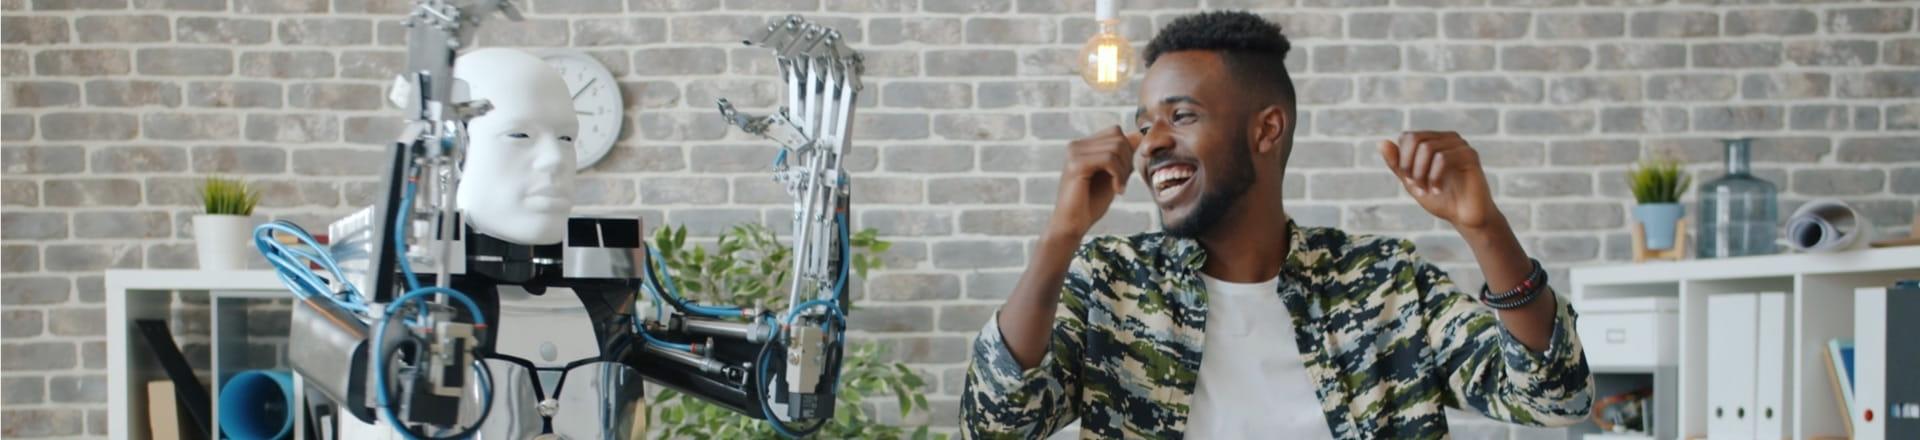 A robot alongside a person